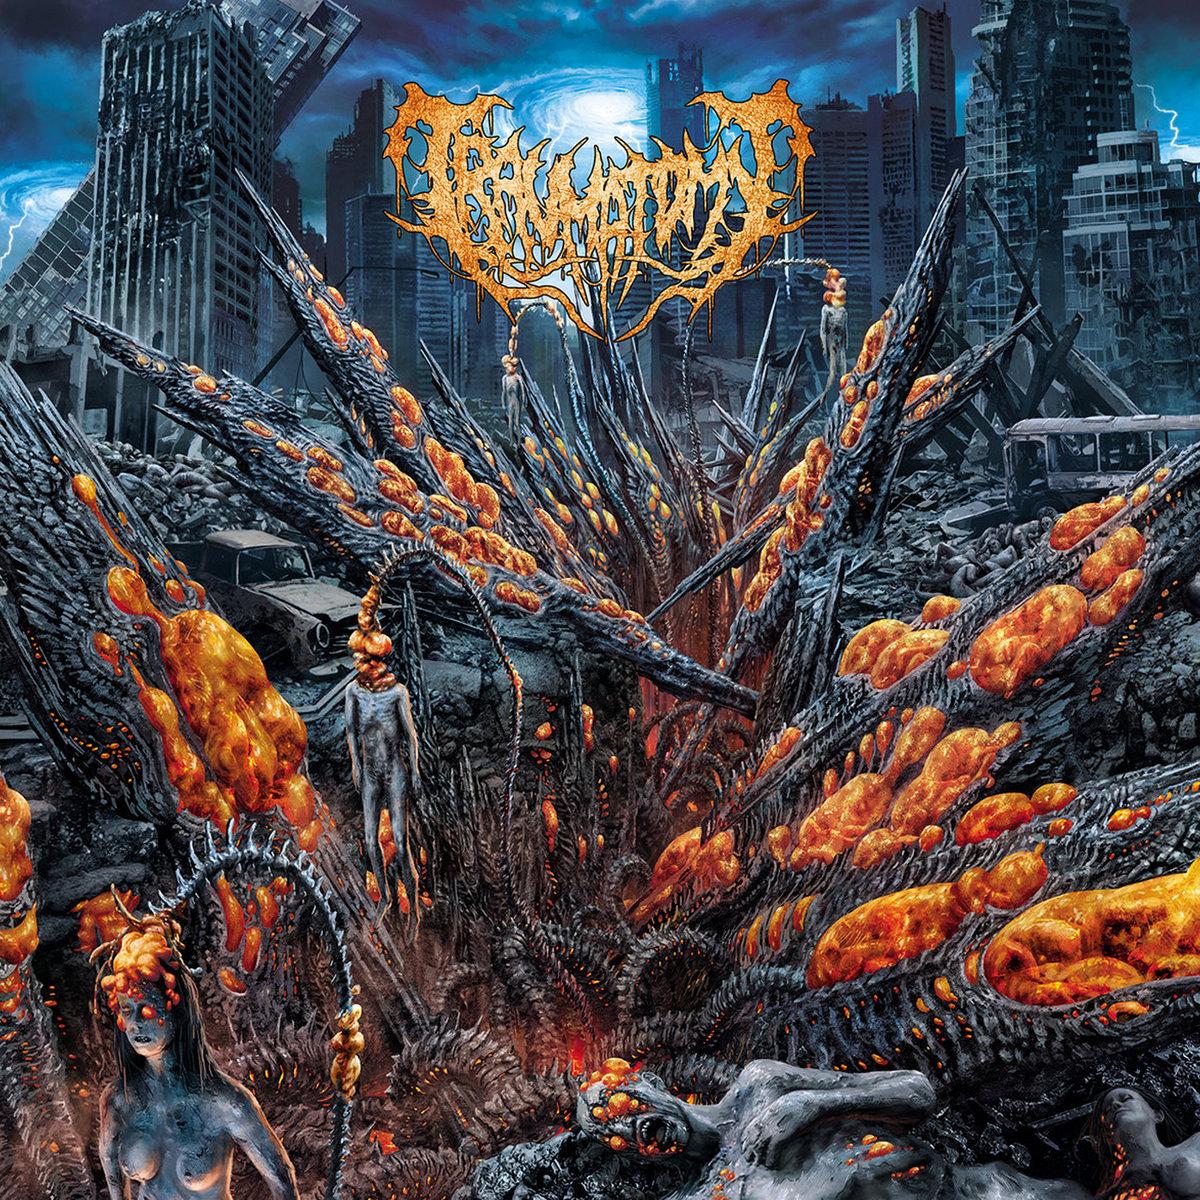 Extirpation Paradigms Traumatomy Album Cover Artwork